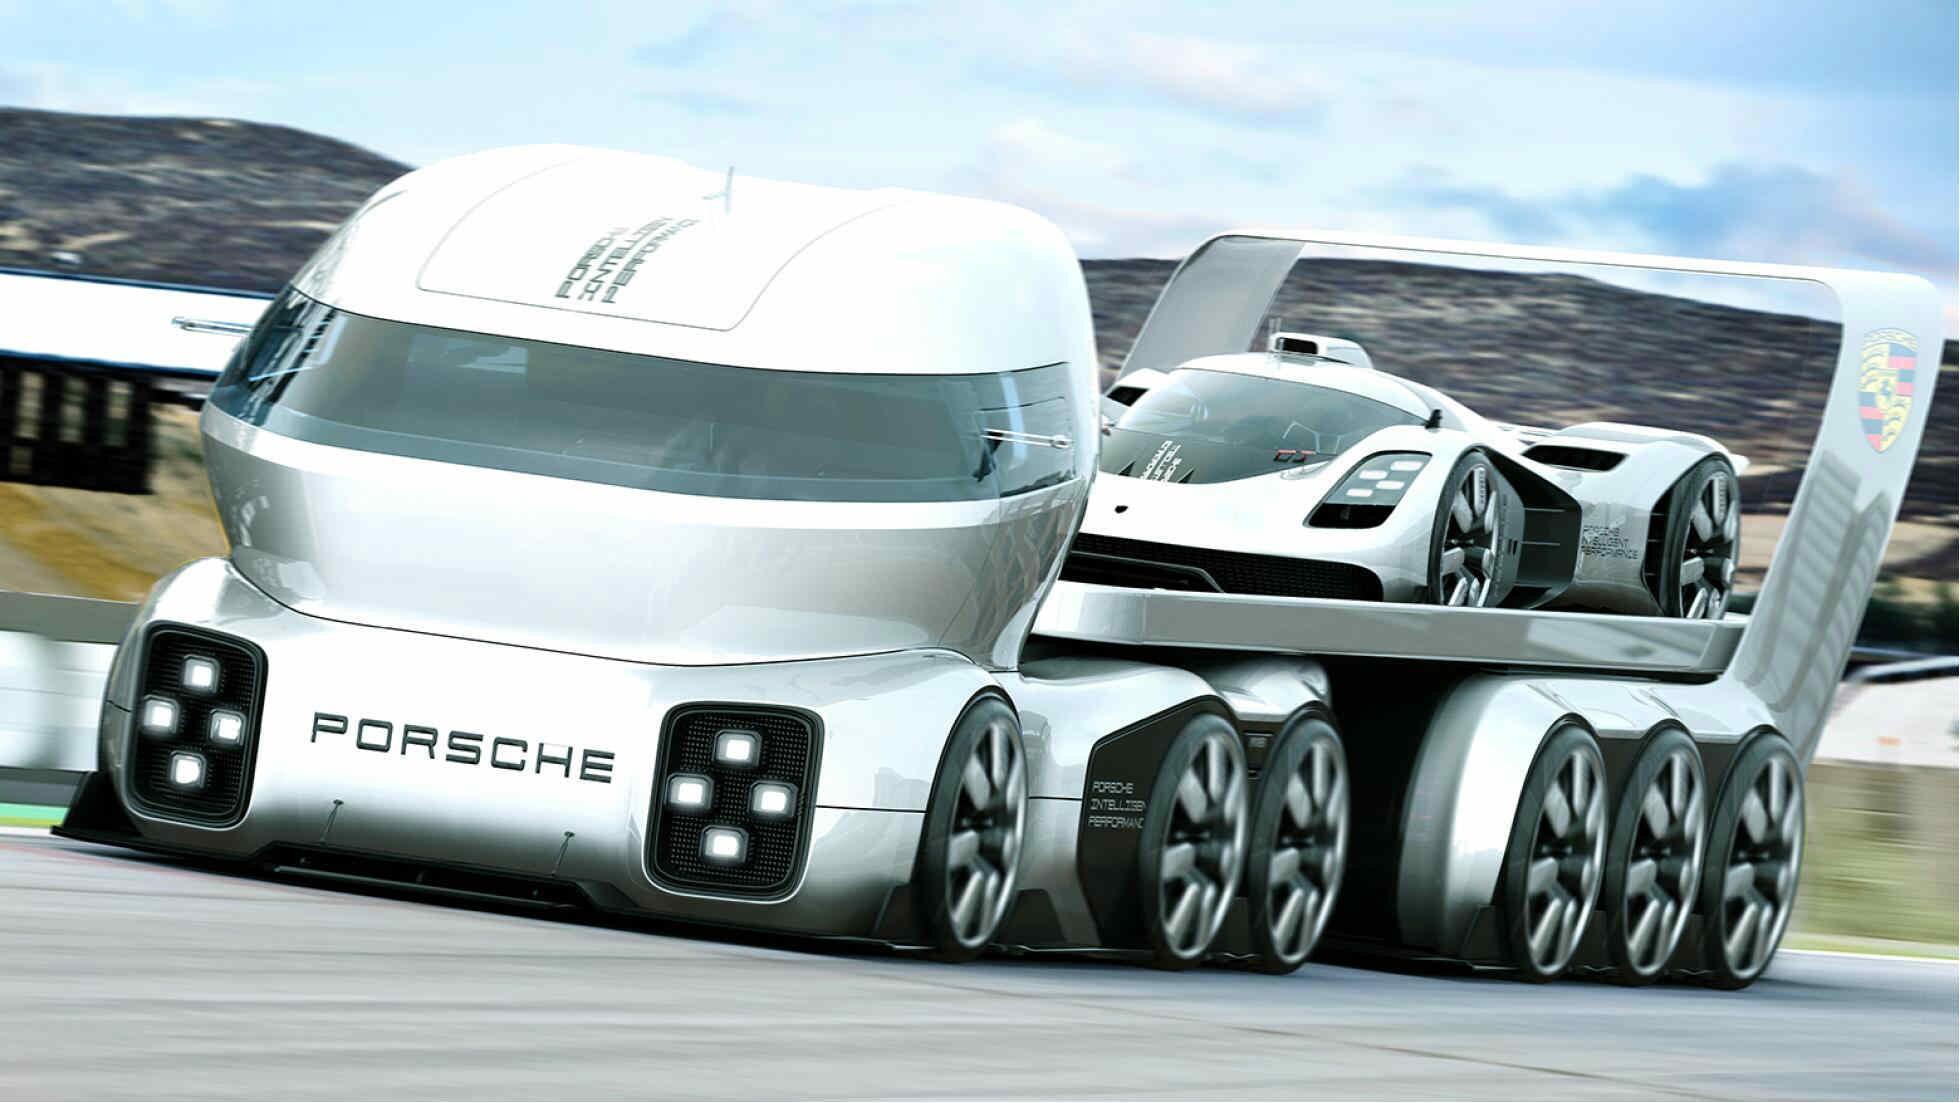 Should Porsche make this futuristic race transporter?